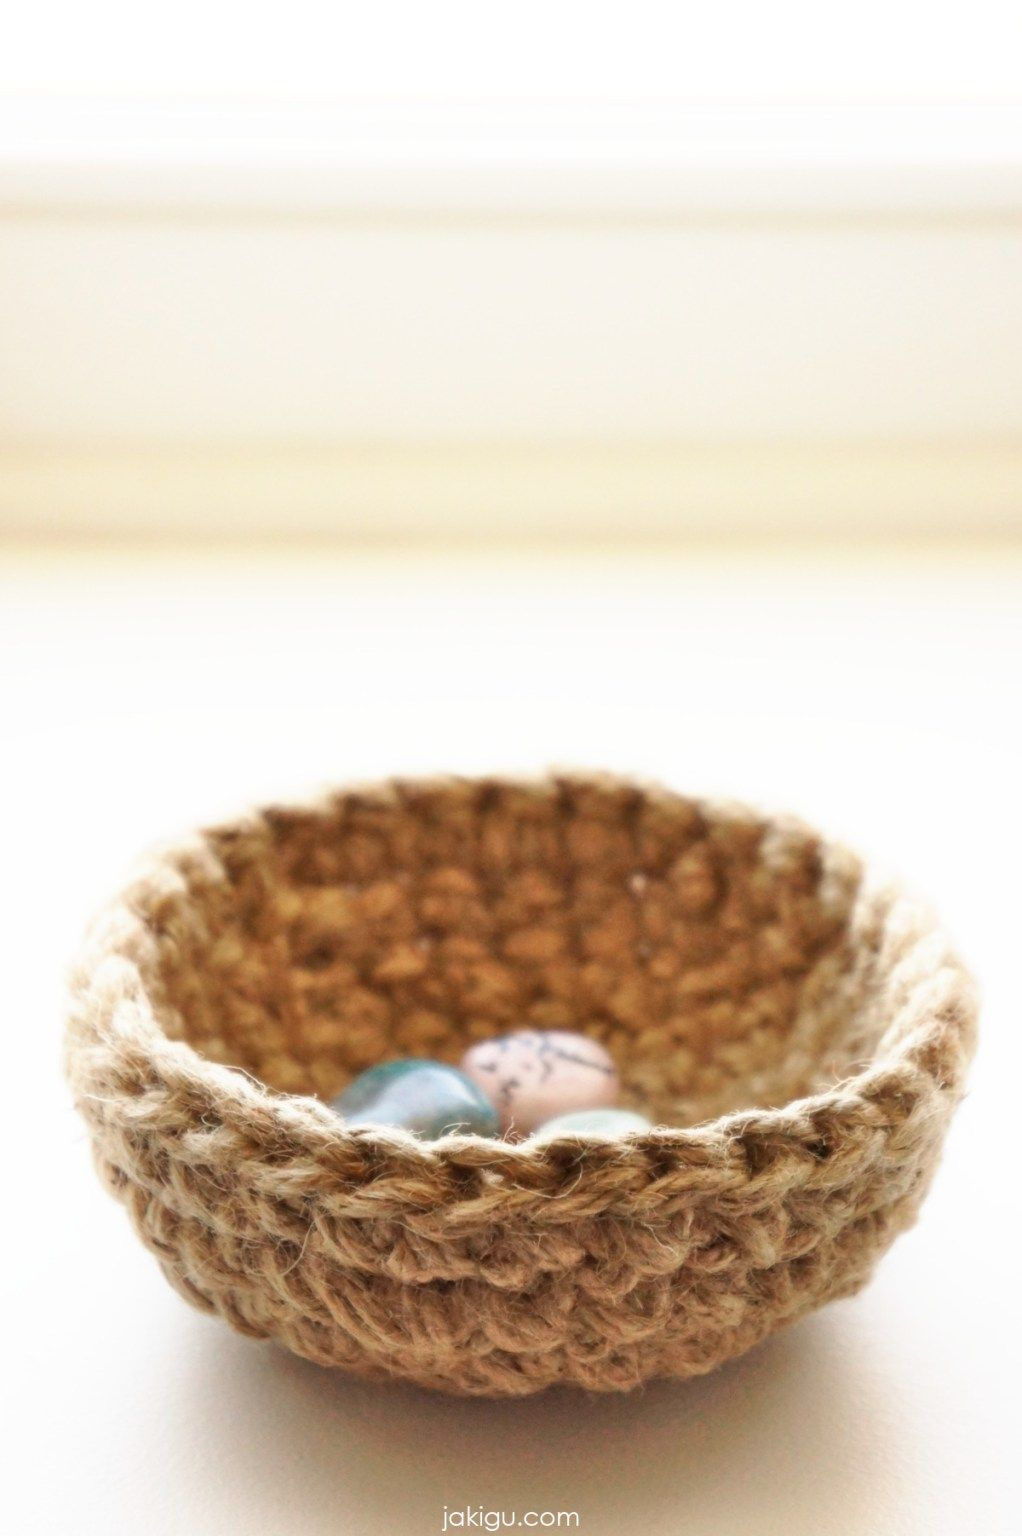 Tiny Jute Bowl Crochet Pattern | jakigu.com